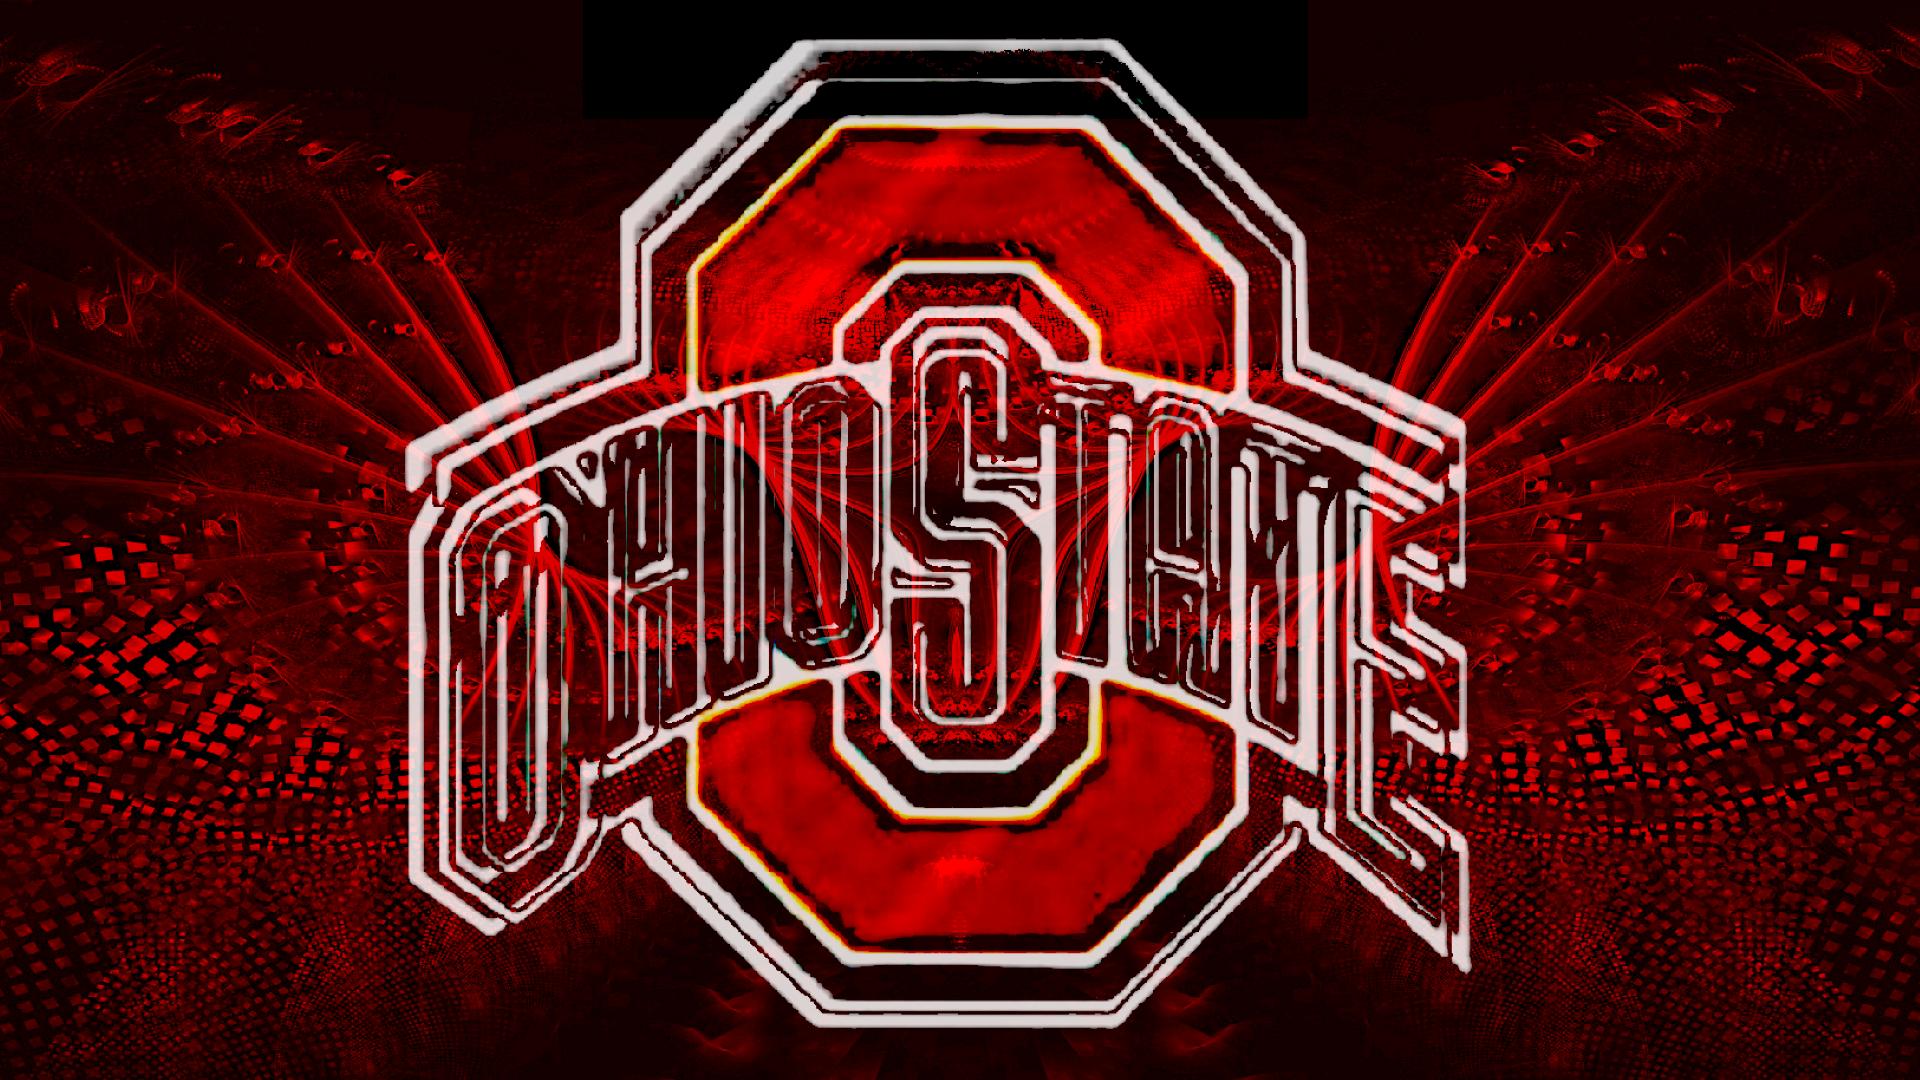 OHIO STATE GRAY BLOCK O - Ohio State Buckeyes Wallpaper